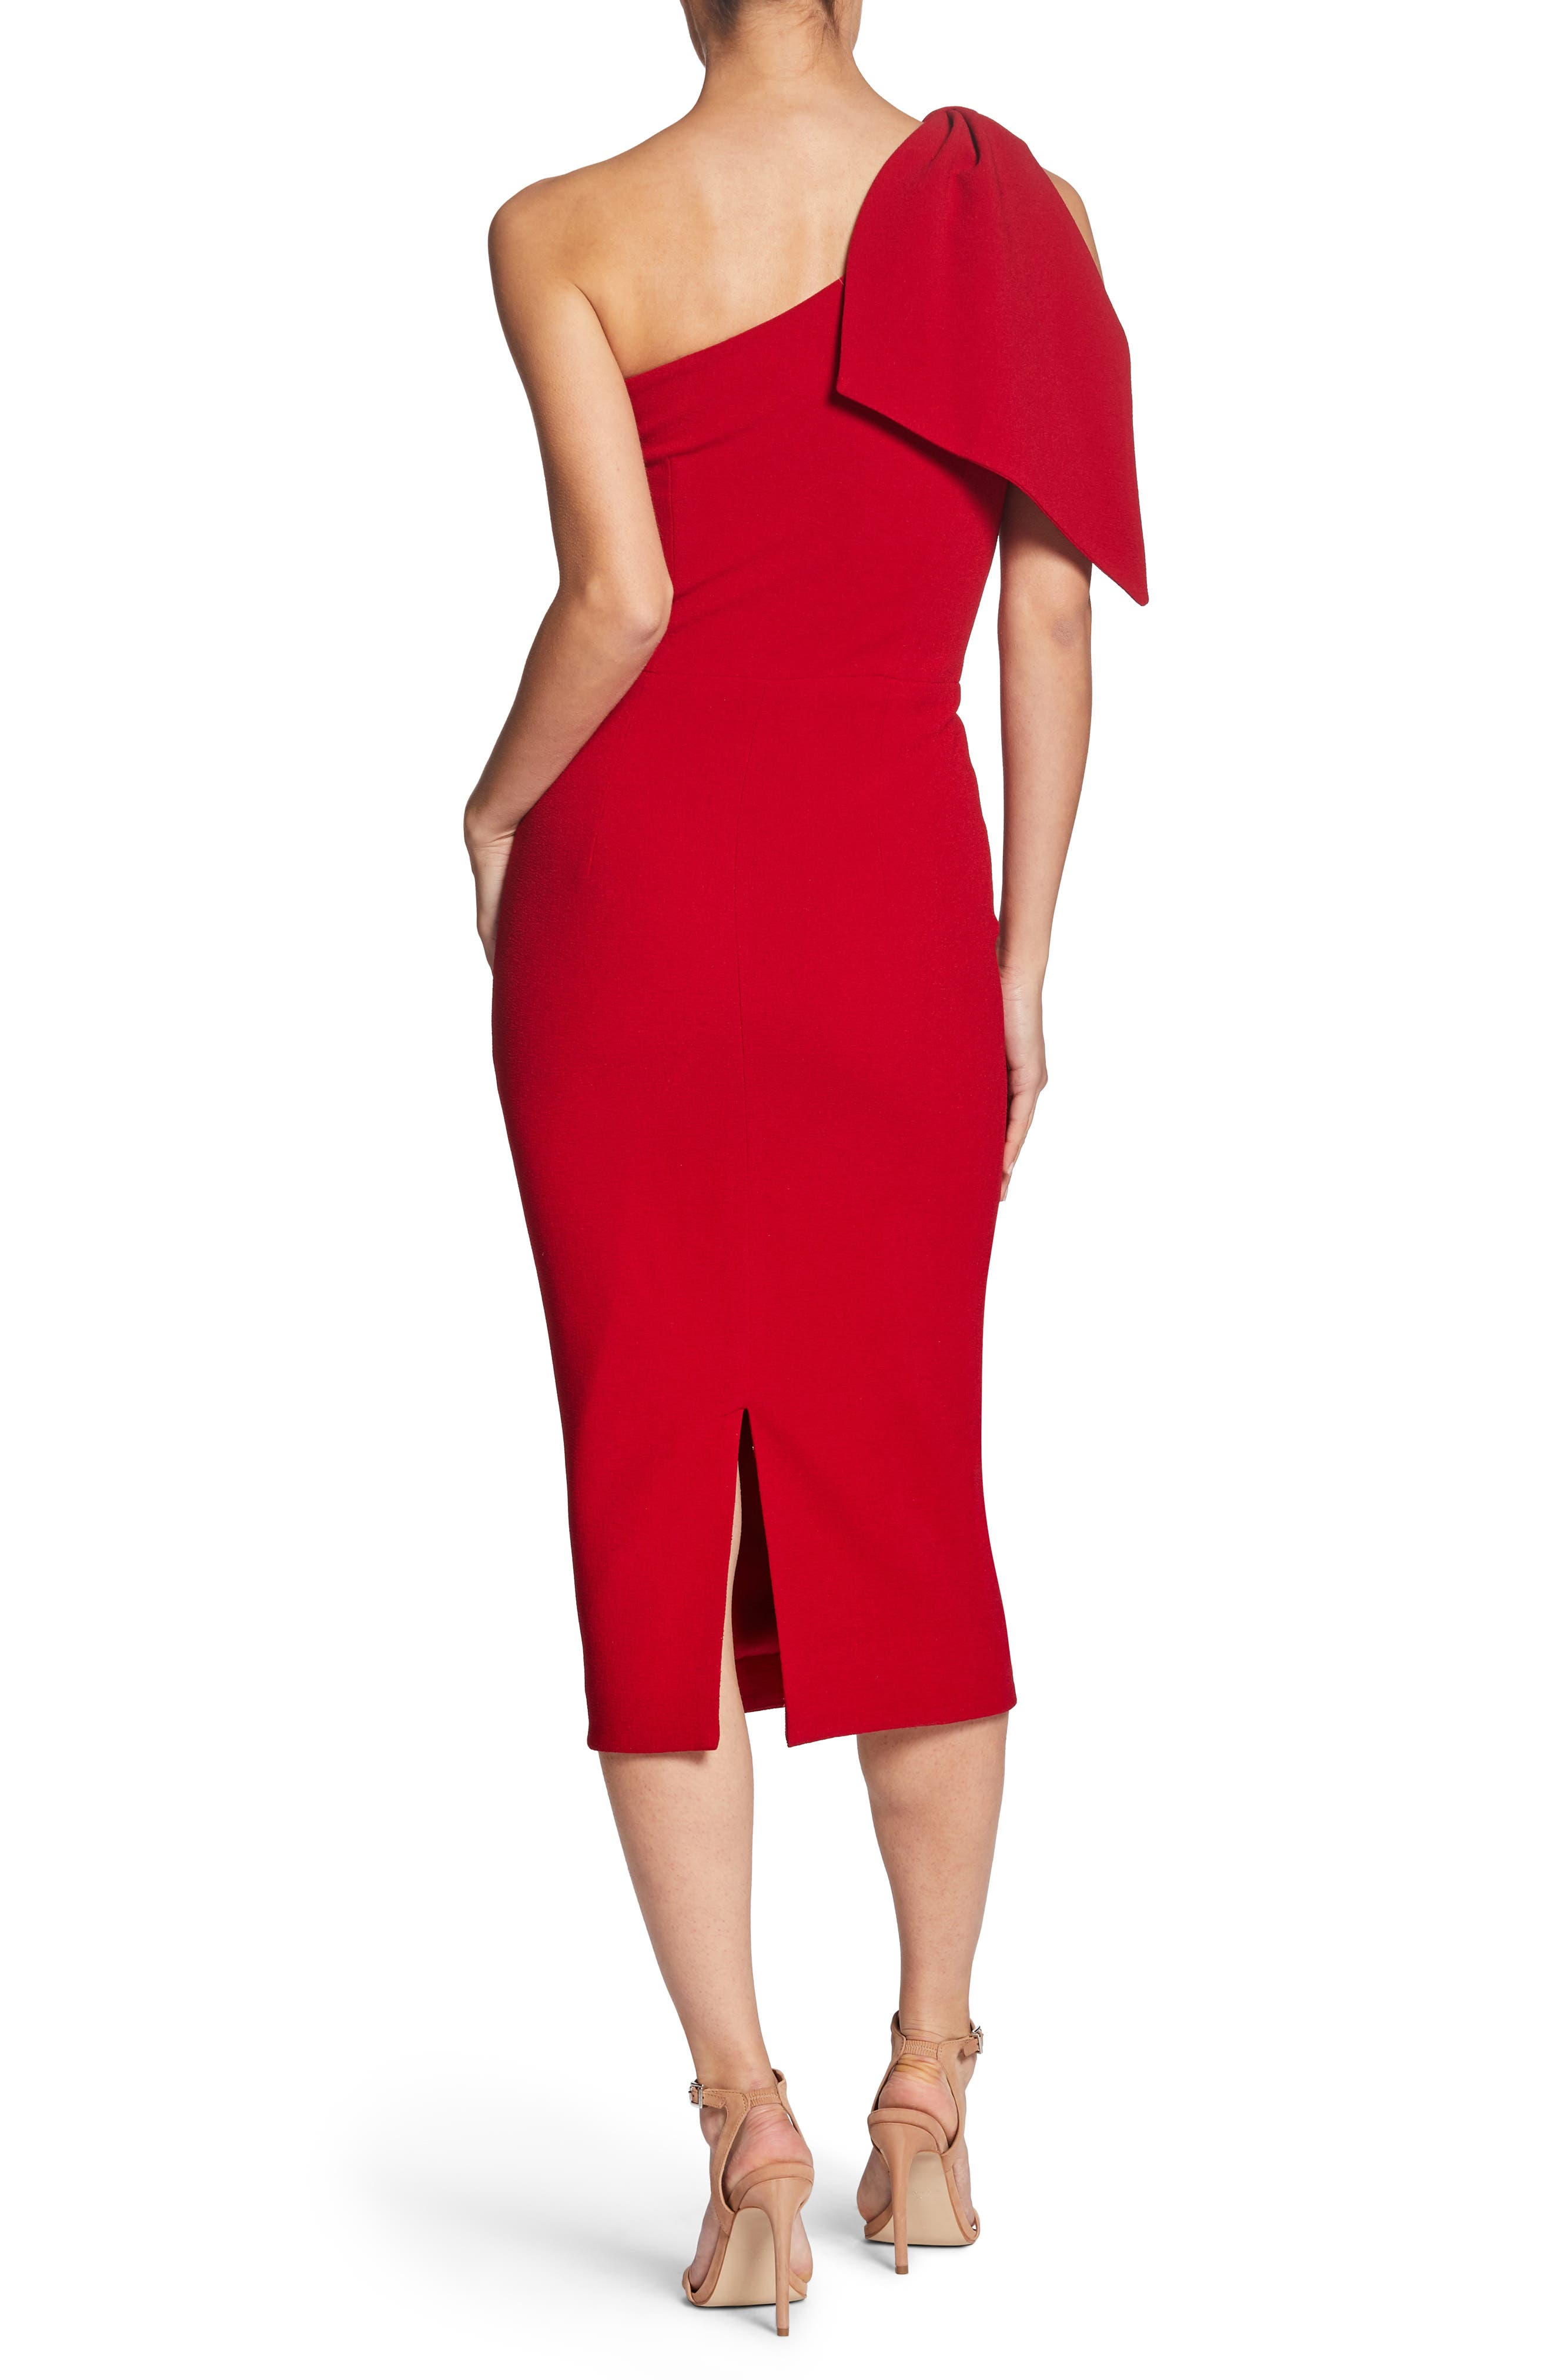 Tiffany One-Shoulder Midi Dress,                             Alternate thumbnail 2, color,                             Garnet